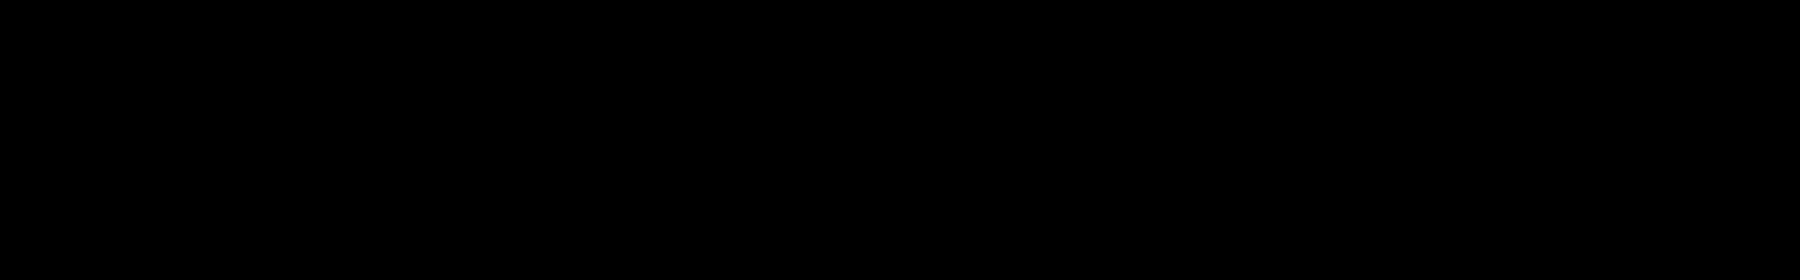 Goldn audio waveform